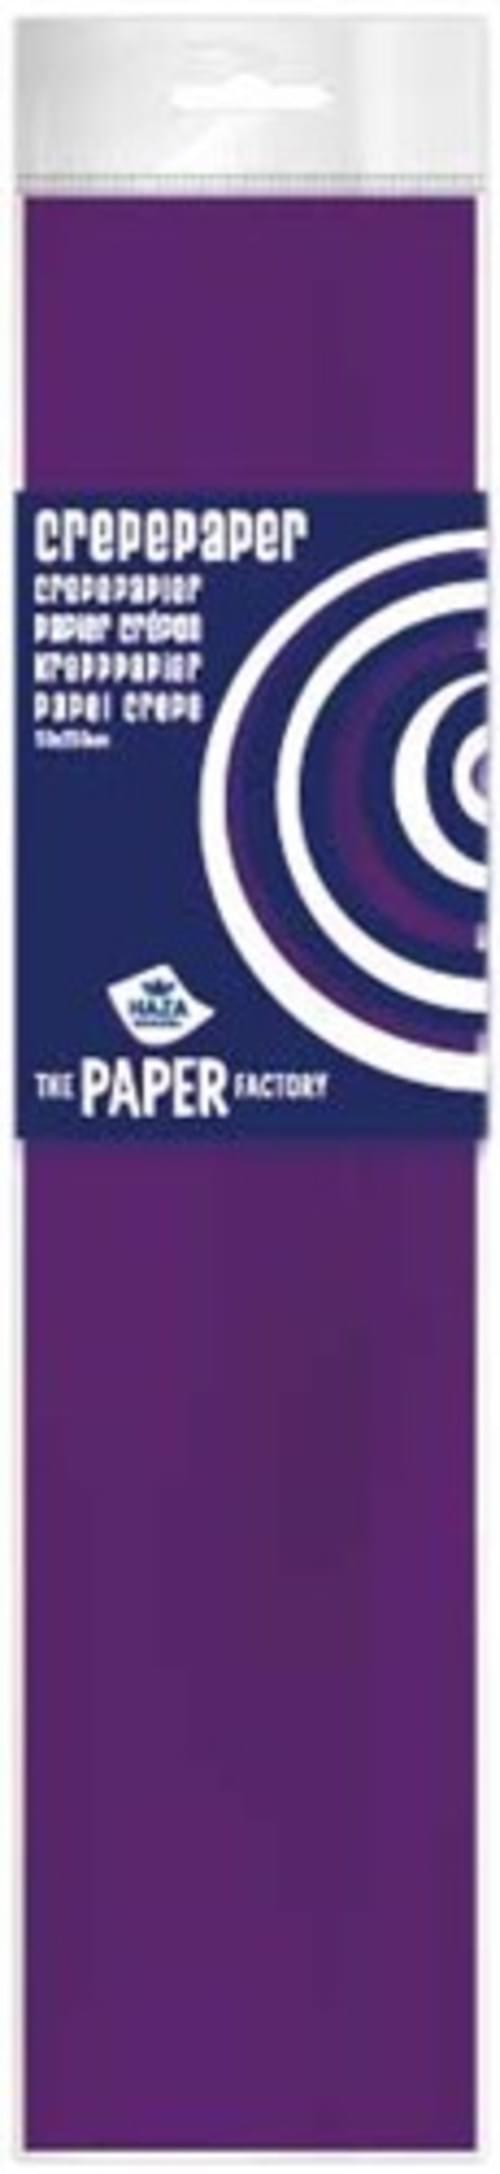 Crepe Paper Violet  10pk